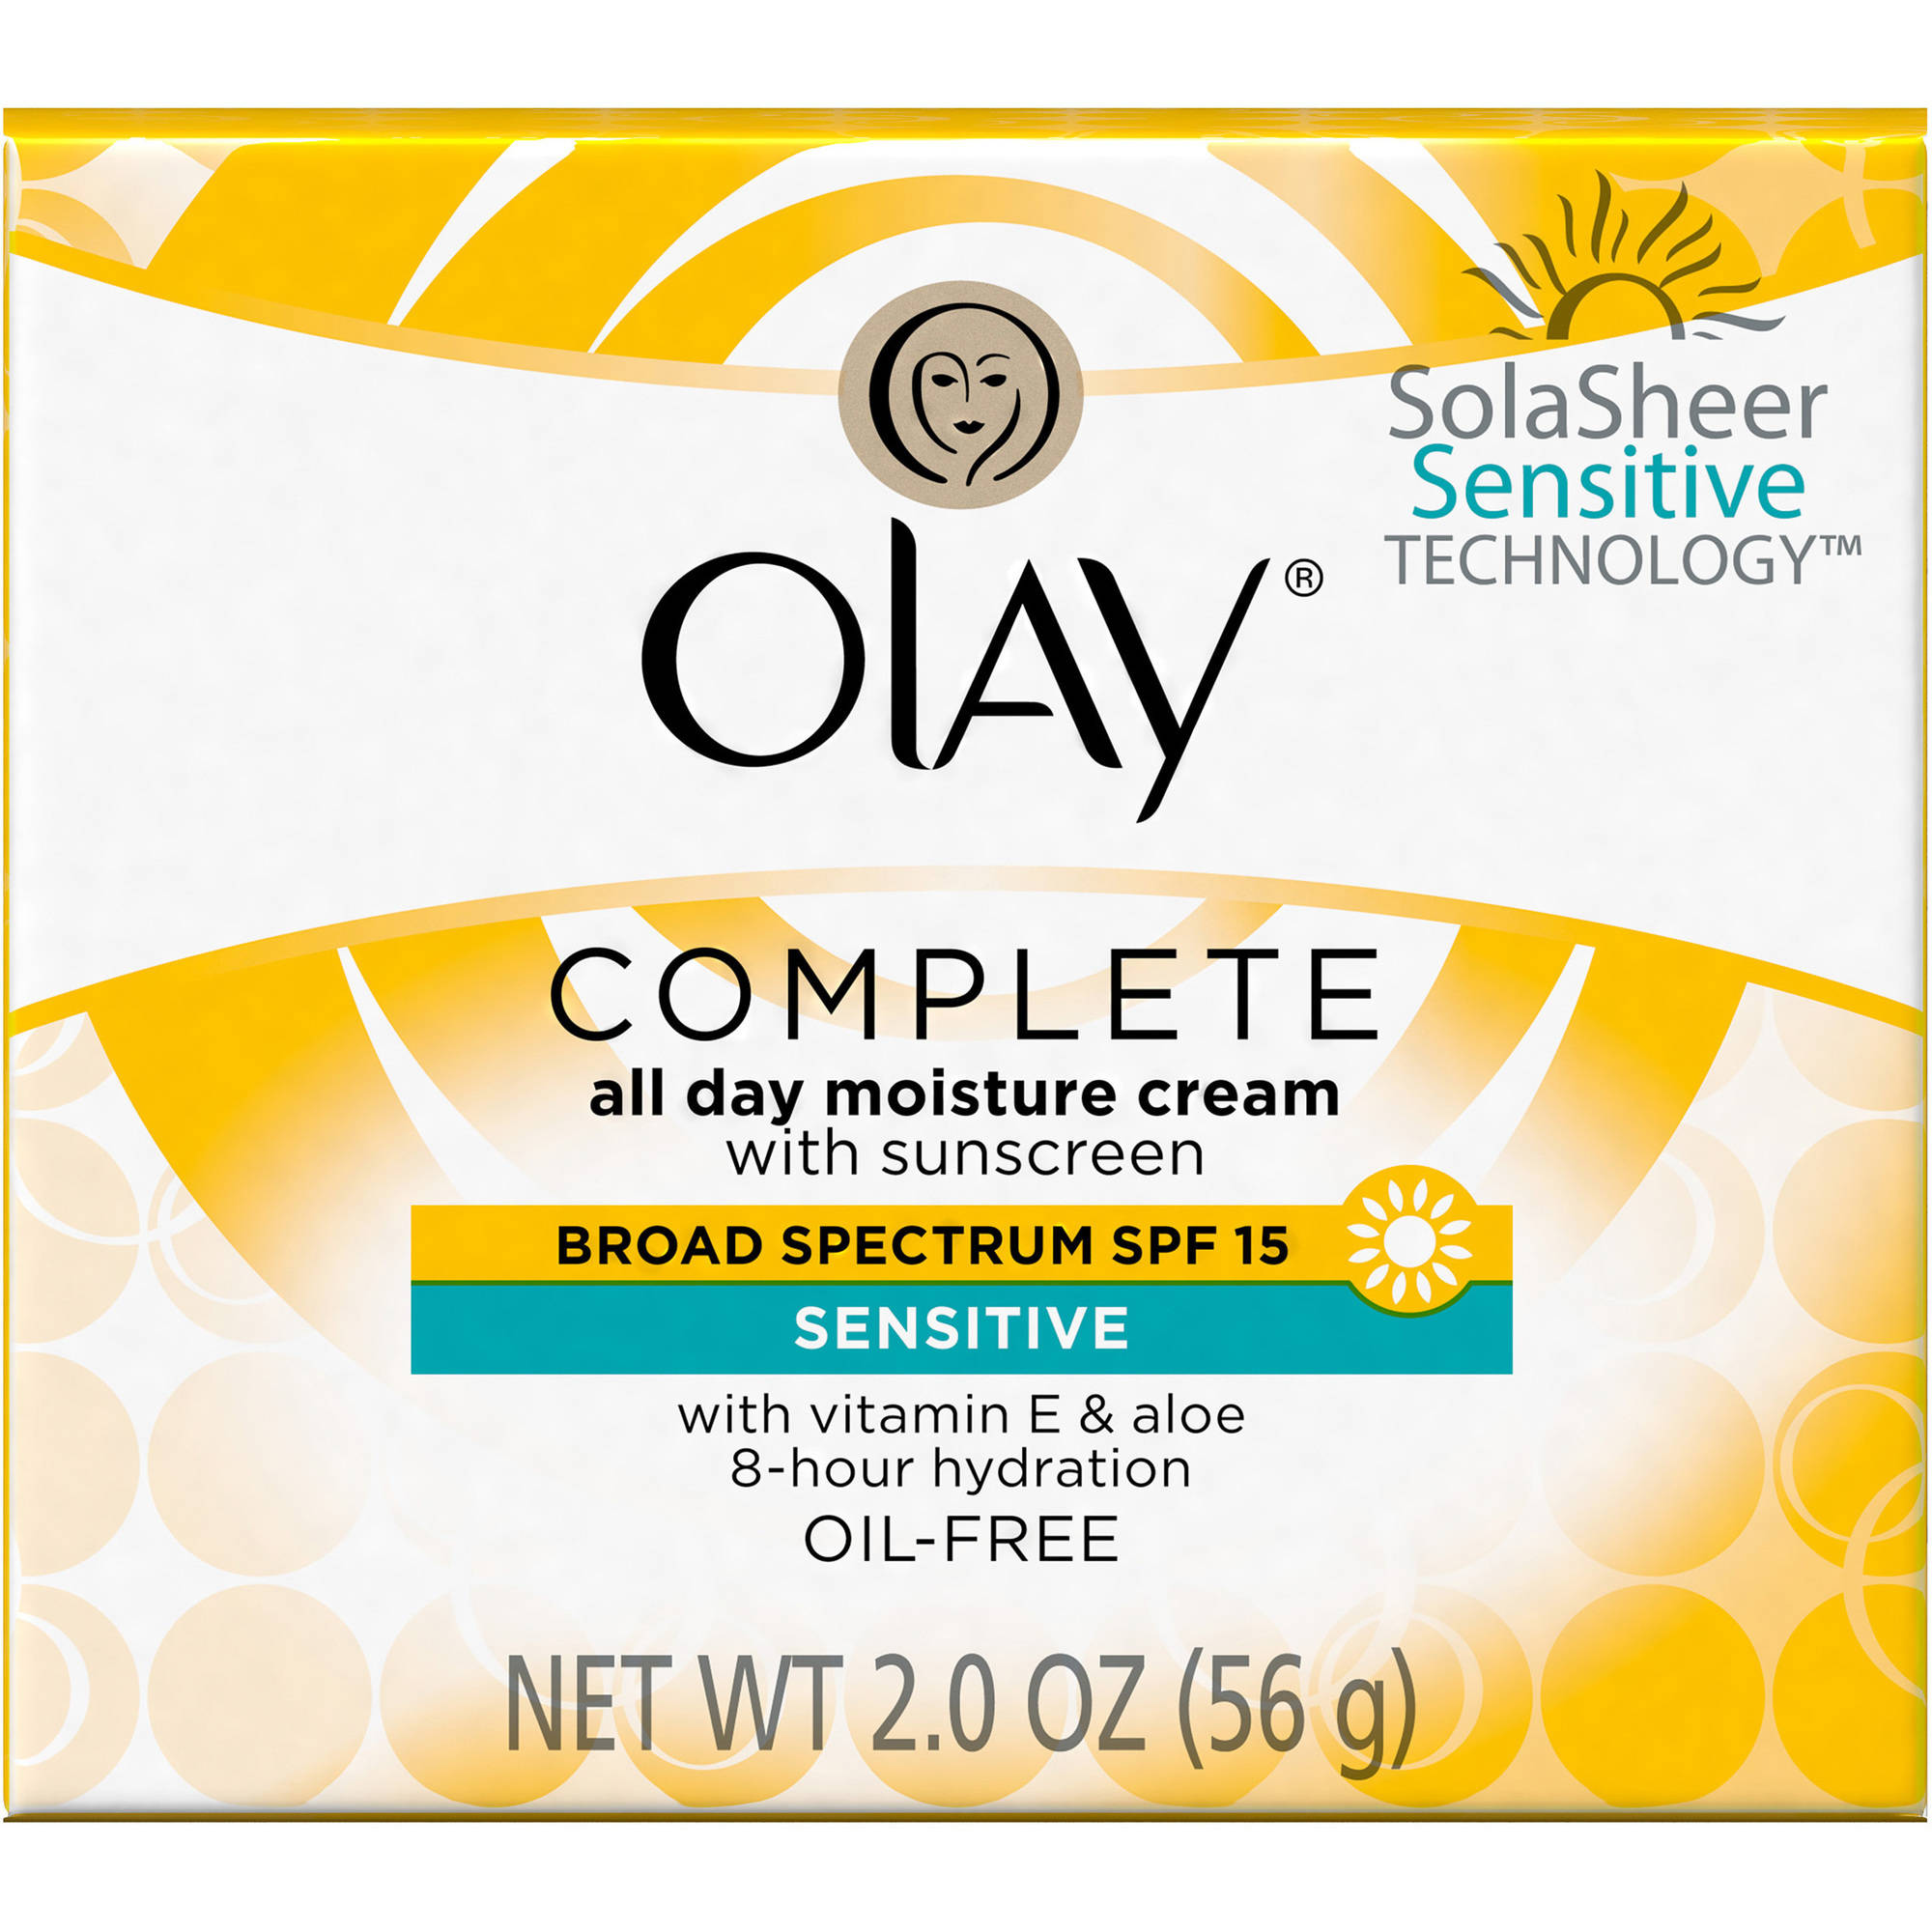 Olay Complete Facial Moisturizer Cream SPF 15 Sensitive Skin 2 oz